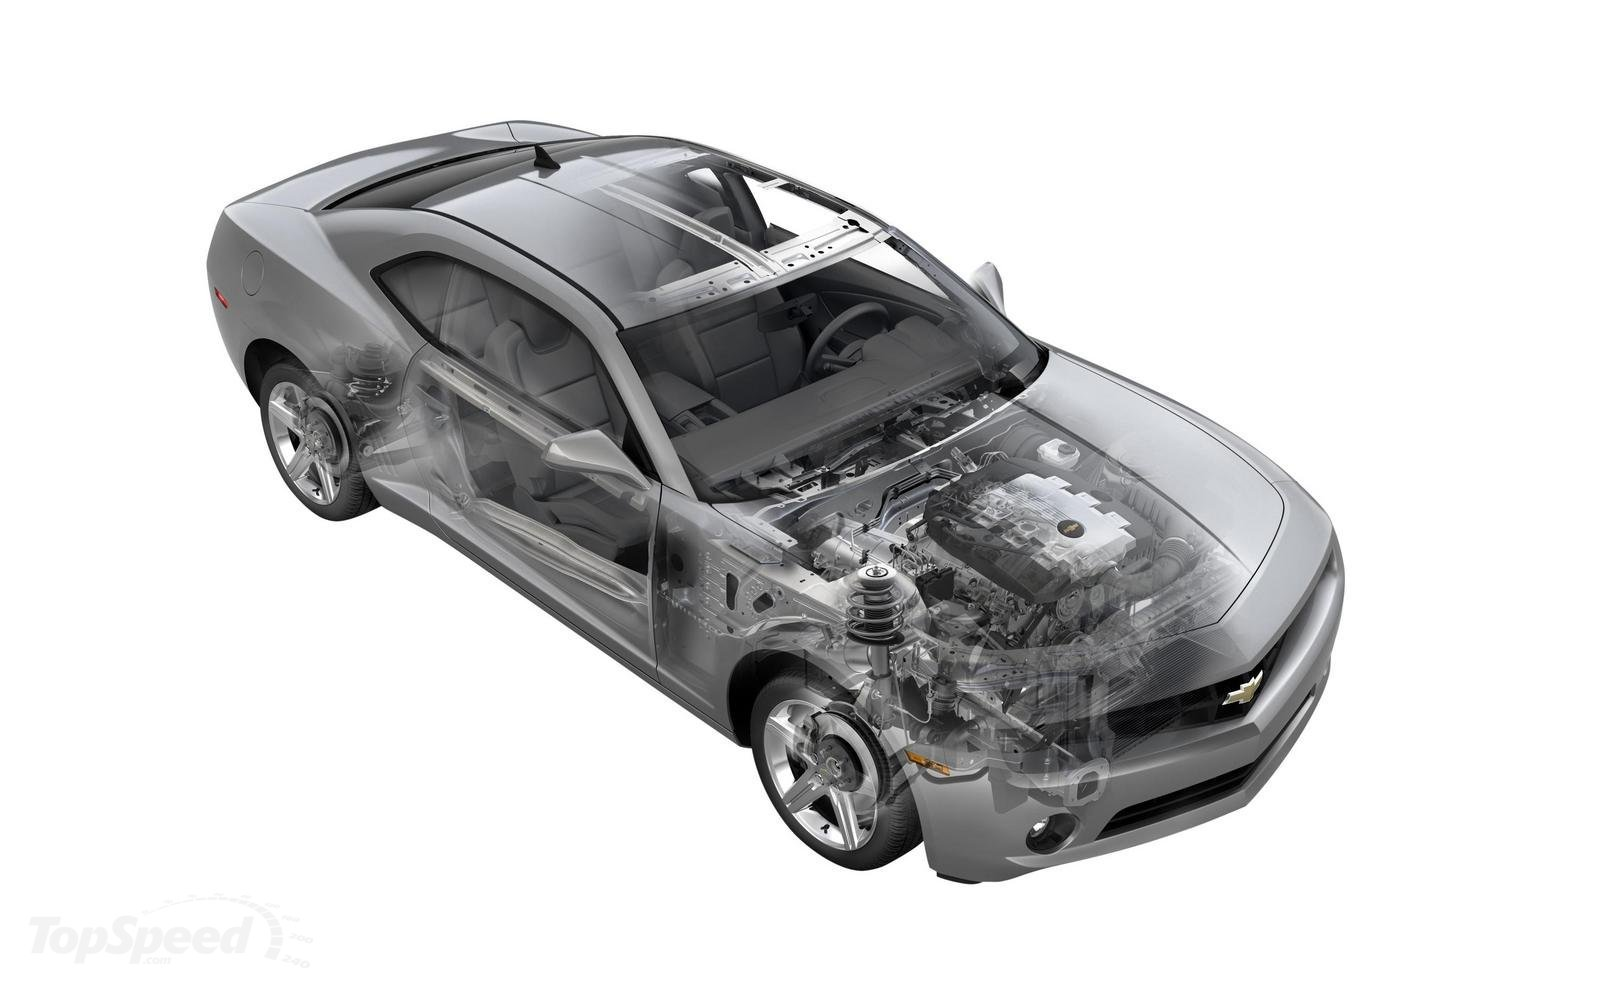 2010 Chevrolet Camaro Body Structure UHSS – Boron Extrication